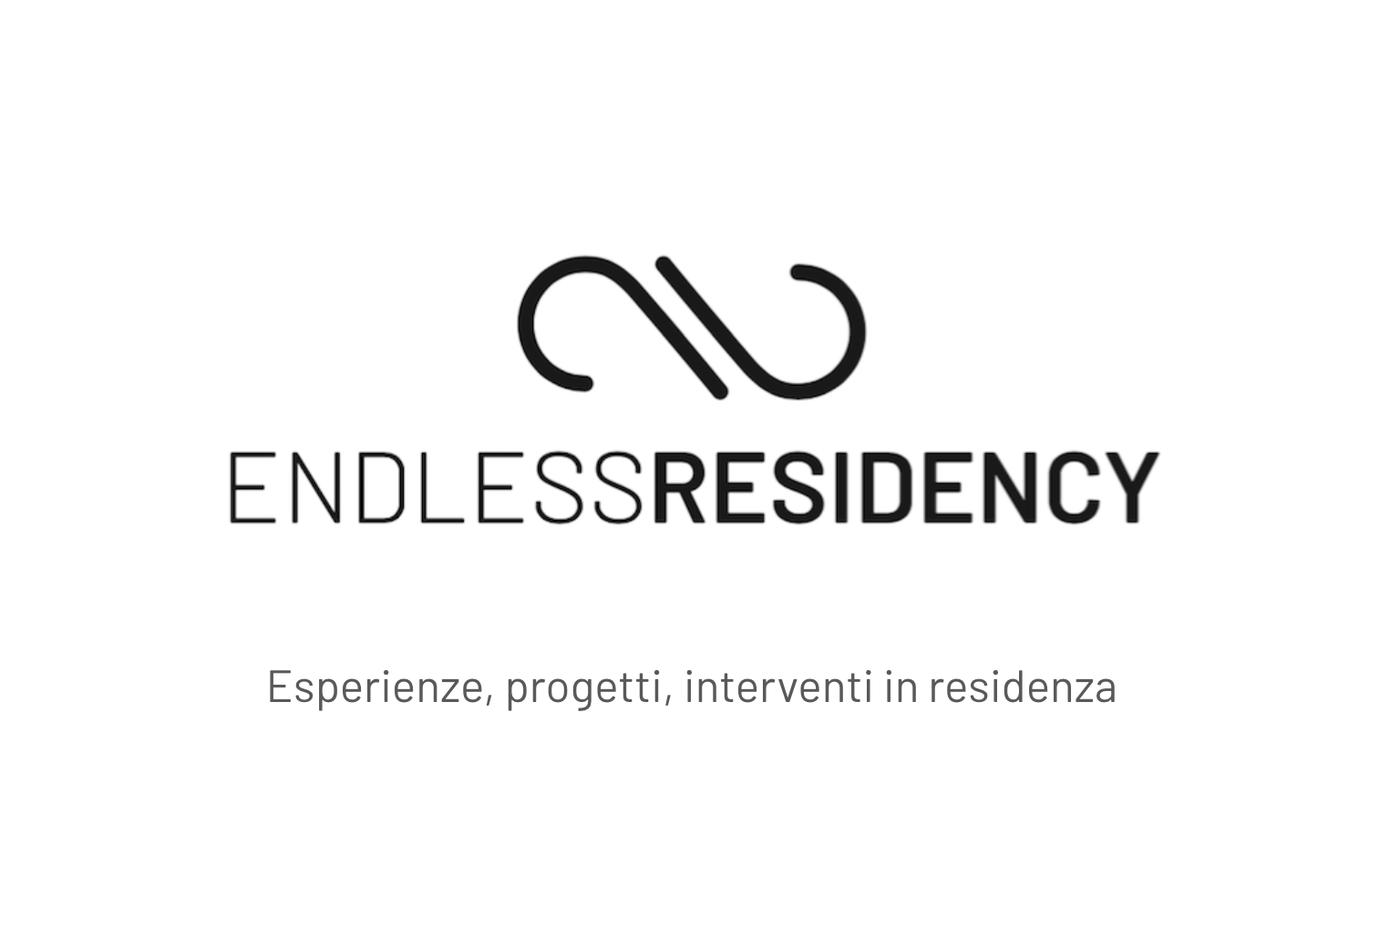 Endless Residency | Esperienze, progetti, interventi in residenza